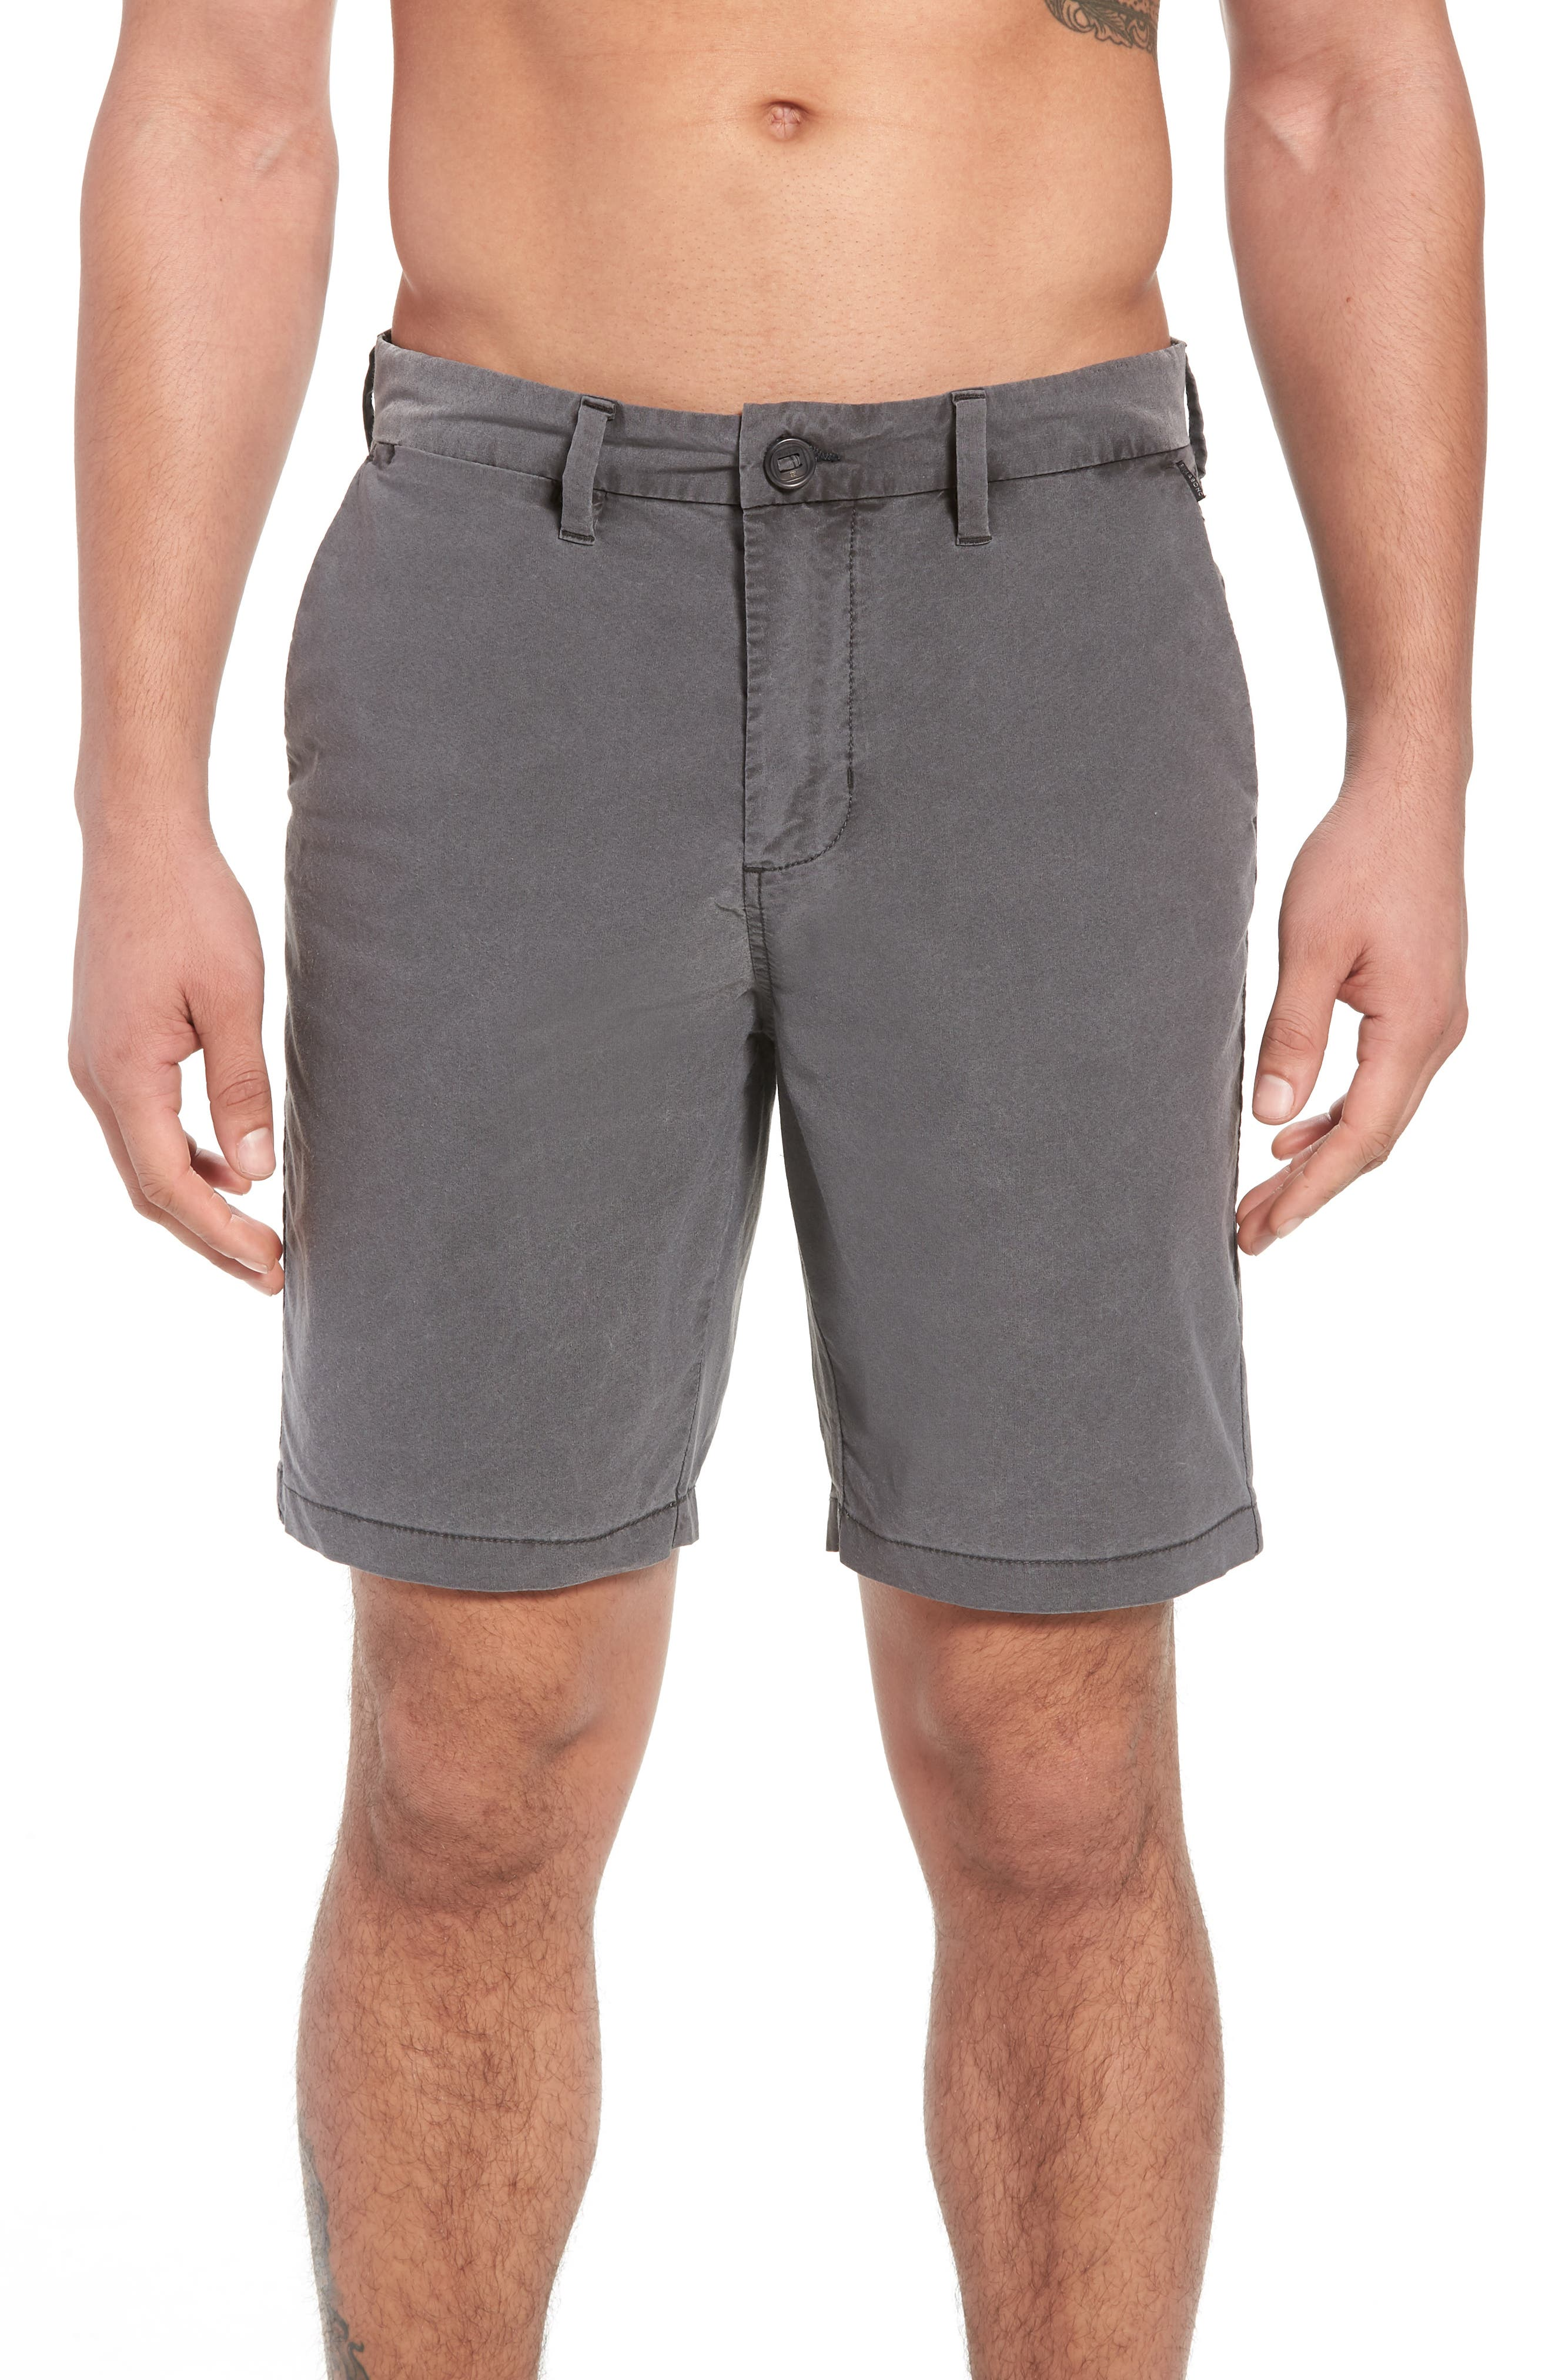 New Order X Overdye Hybrid Shorts,                             Main thumbnail 1, color,                             001